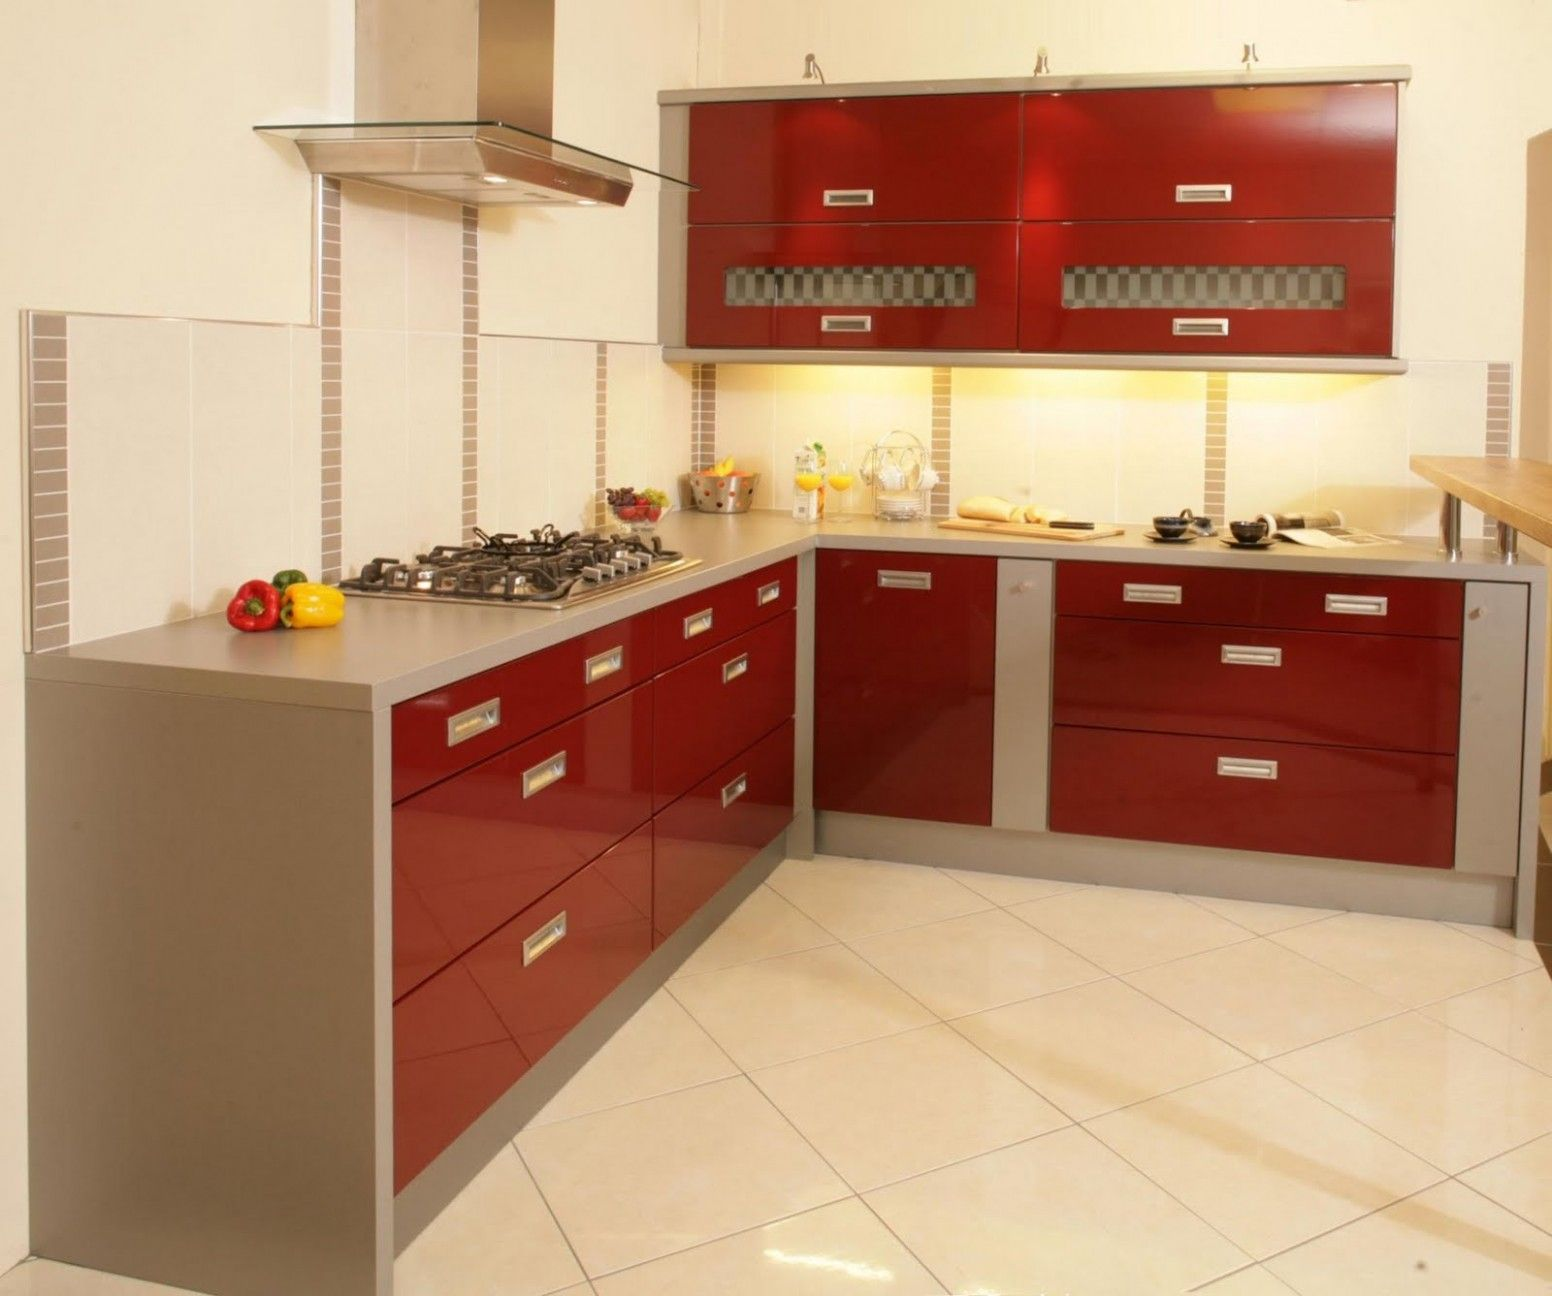 Ten Ideas To Organize Your Own Indian Kitchen Interior Design Photos Simple Kitchen Design Kitchen Furniture Design Indian Kitchen Design Ideas